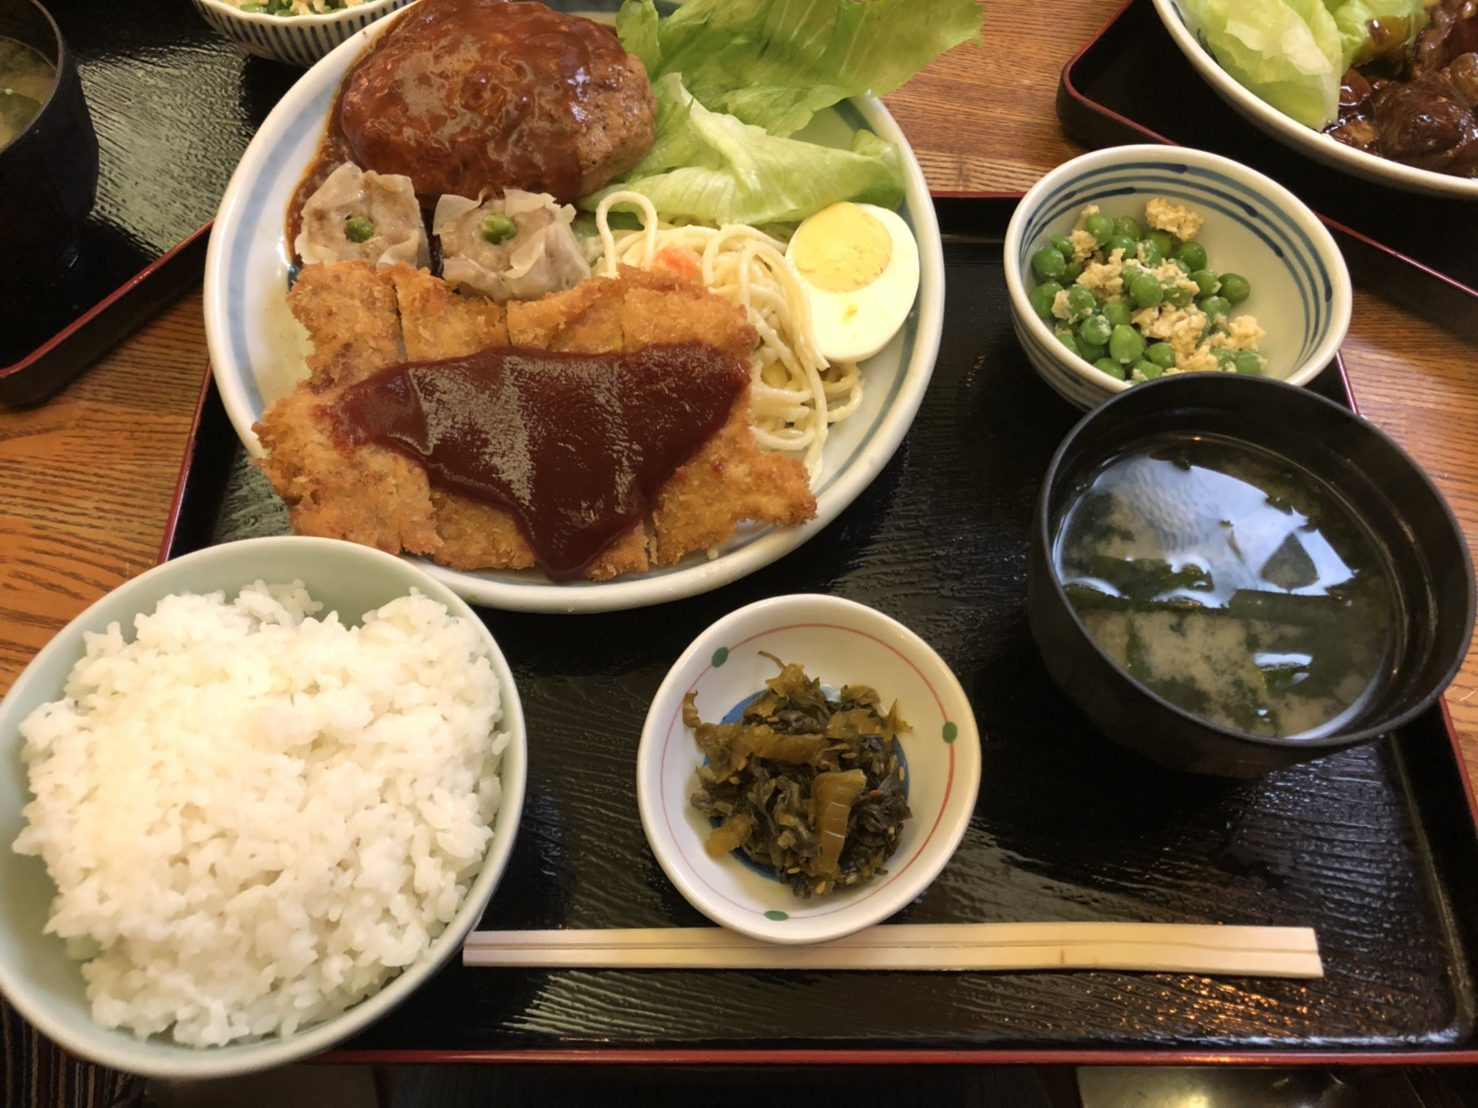 京極スタンド (京都市中京区/食堂居酒屋)